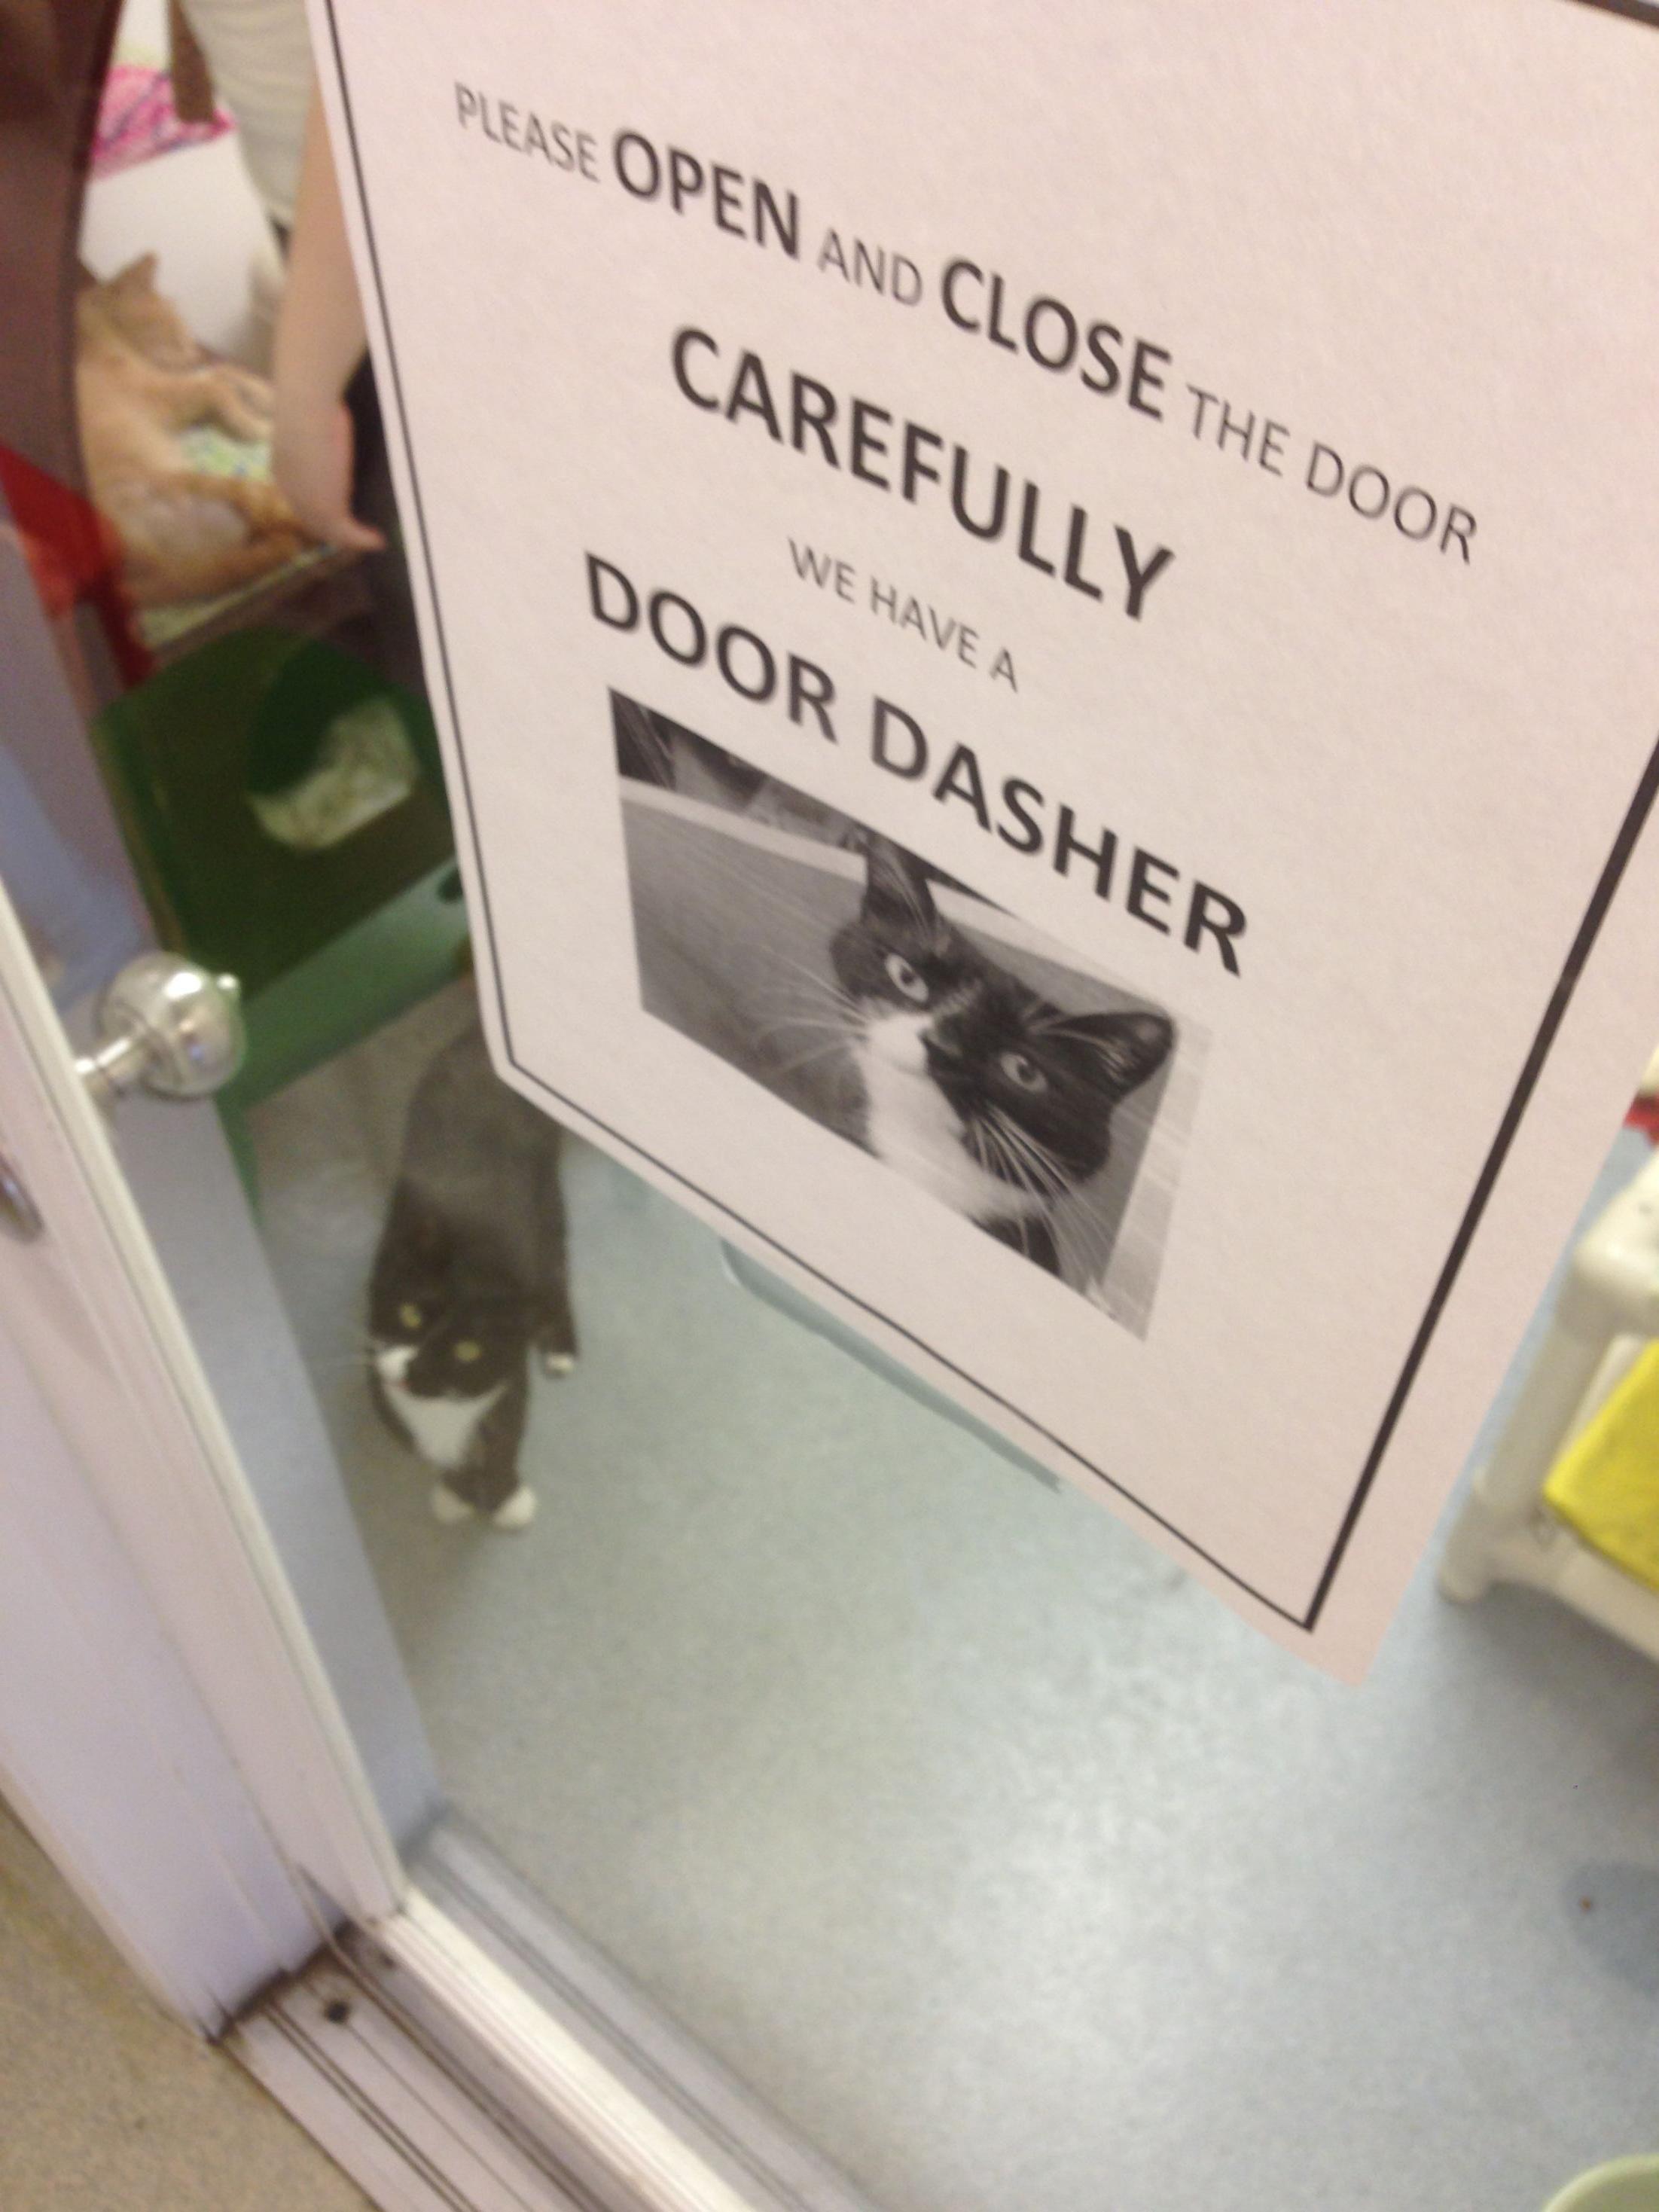 Animal Shelter Sign Wasn T Lying Imgur Funny Pictures Funny Animals Funny Animal Pictures